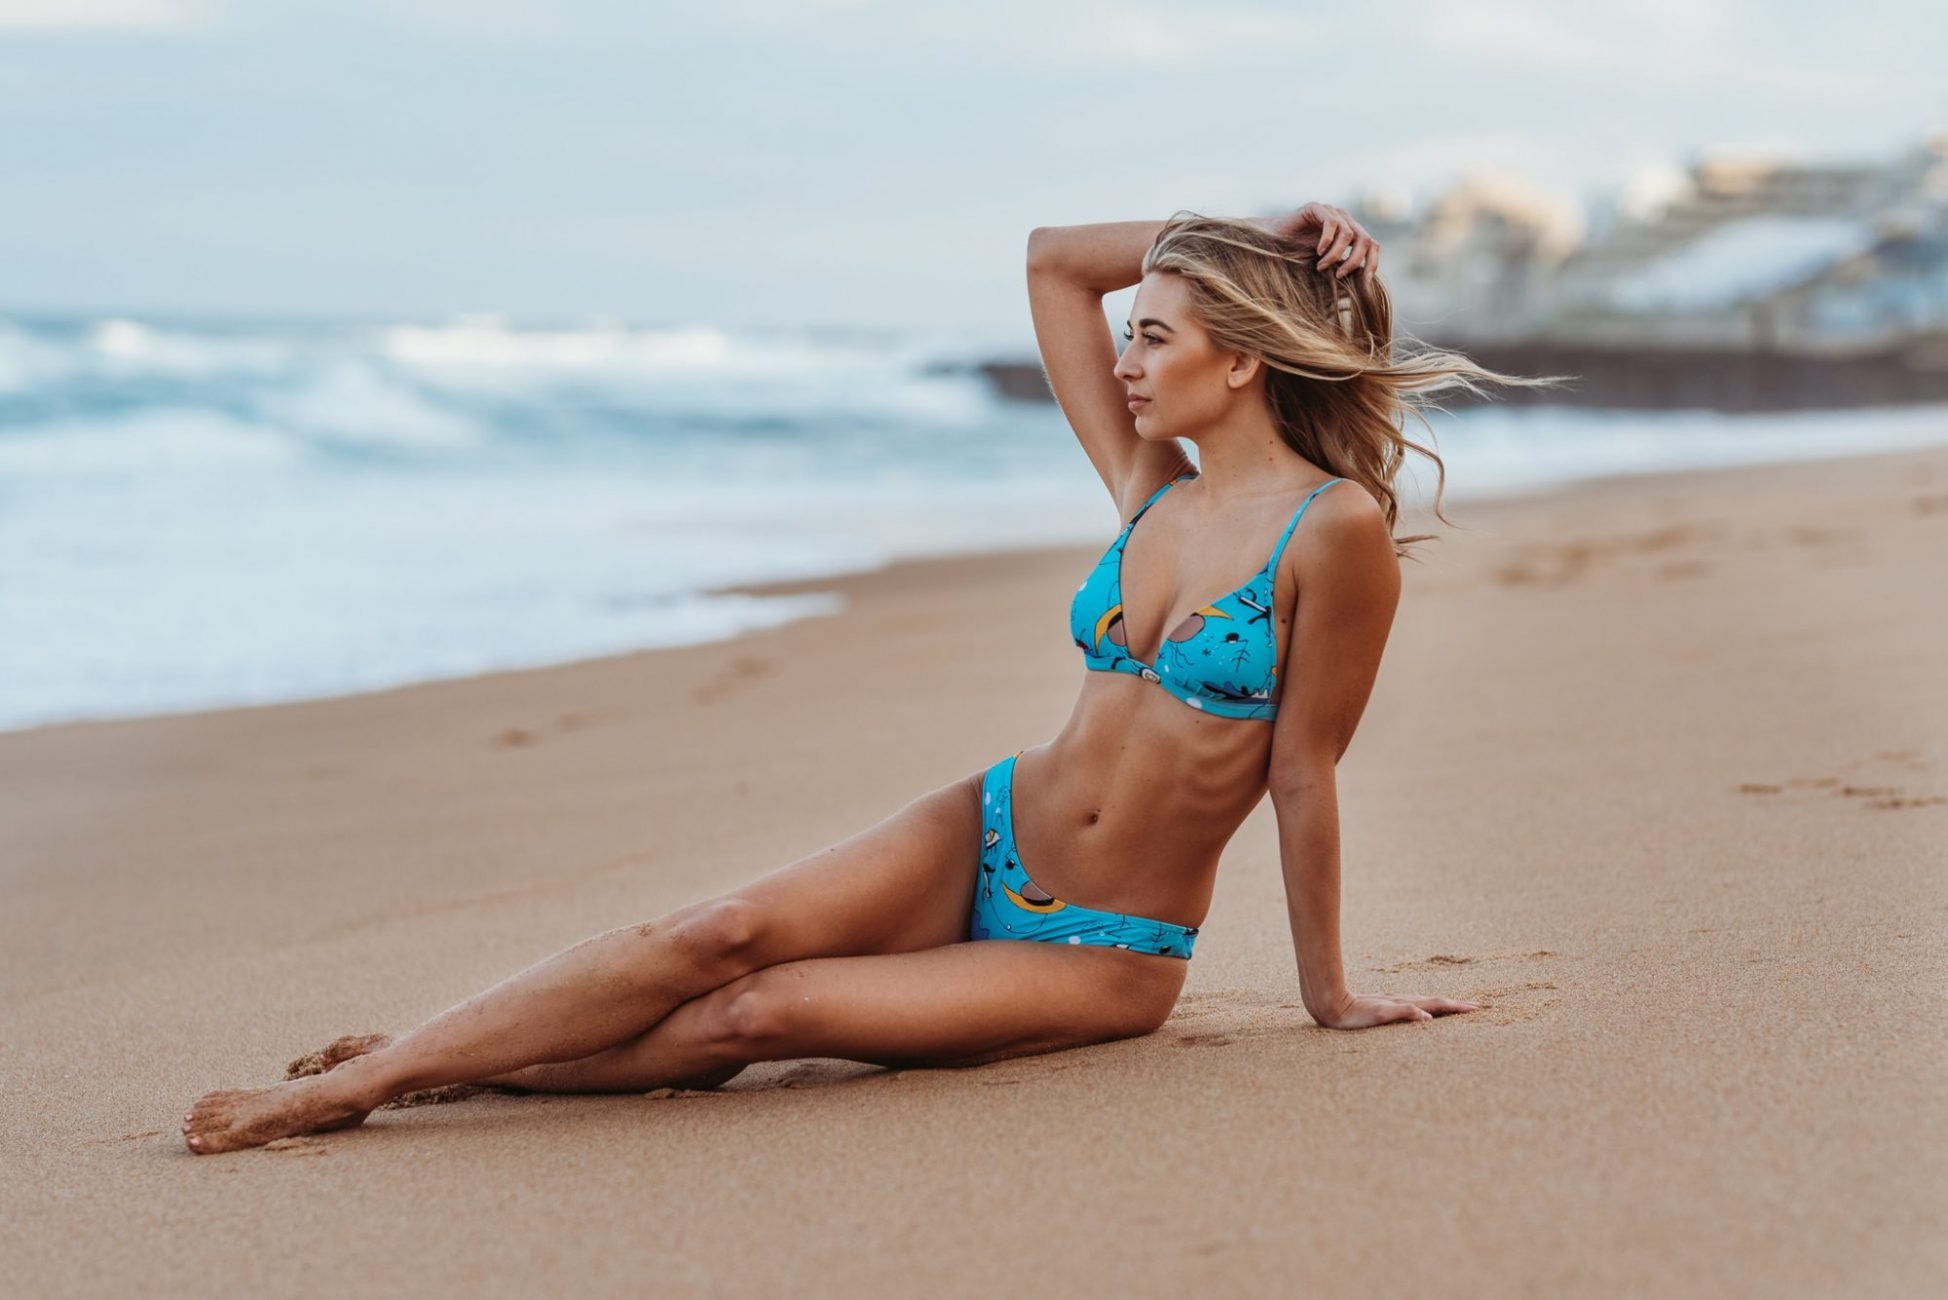 bikini_model_ballito_beach_ocean_sand_sitiing_on_beach